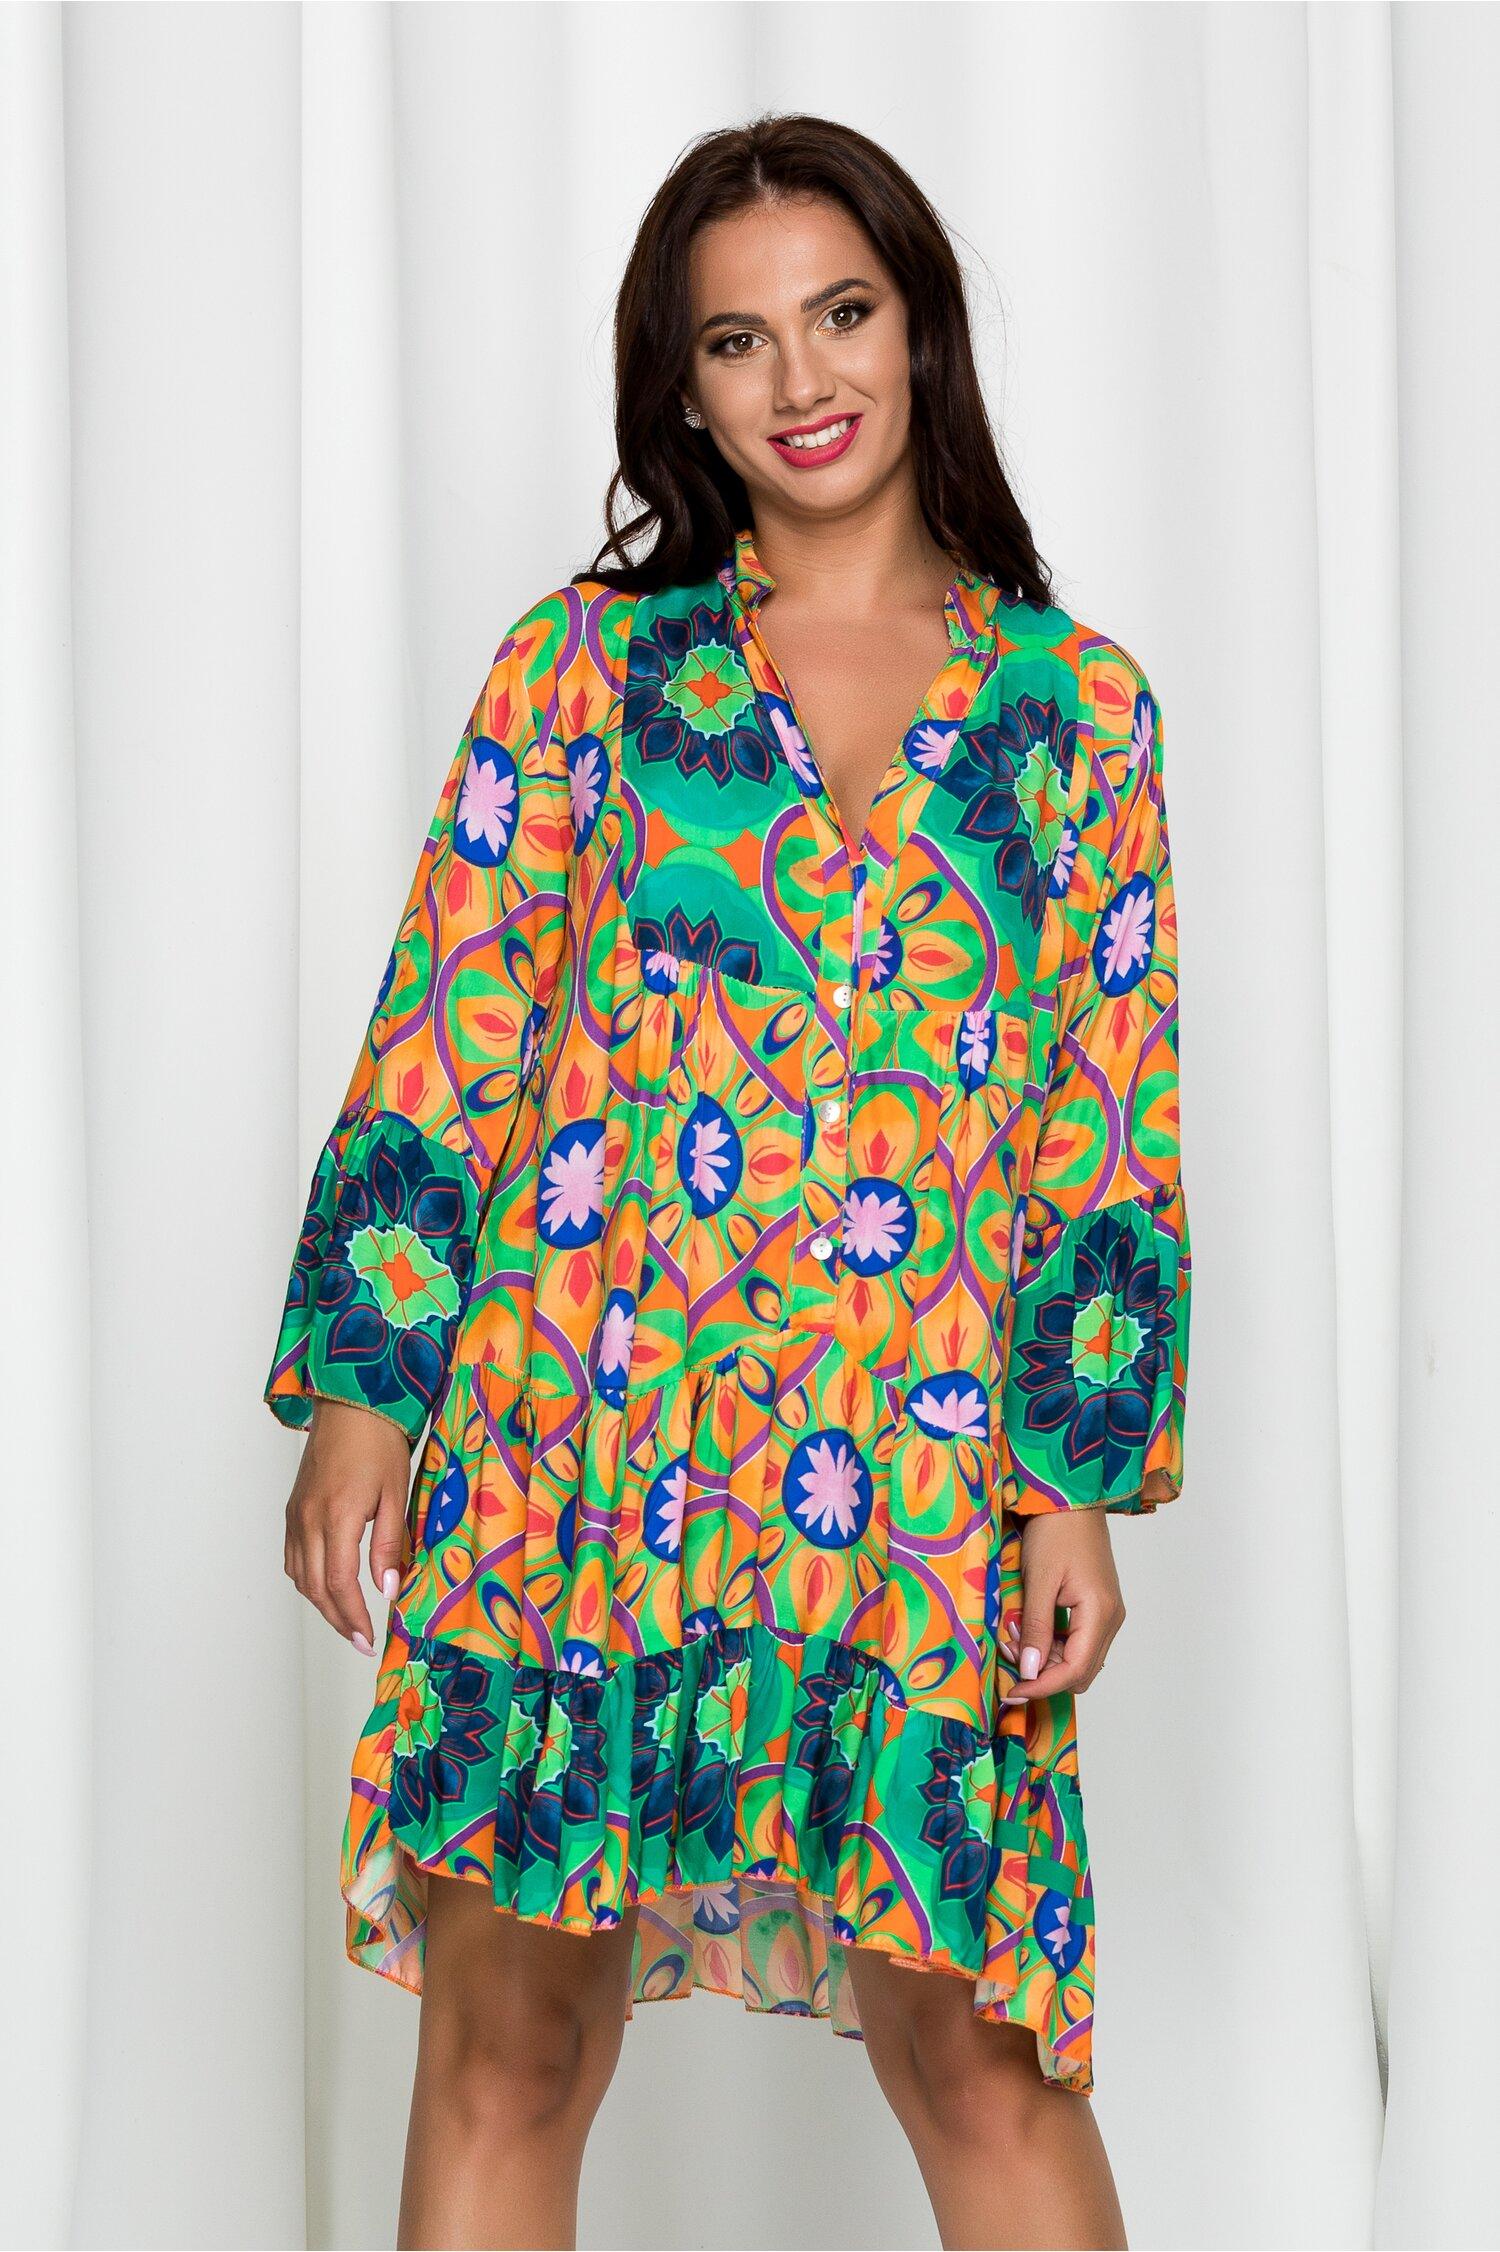 Rochie Youno orange cu imprimeu floral multicolor